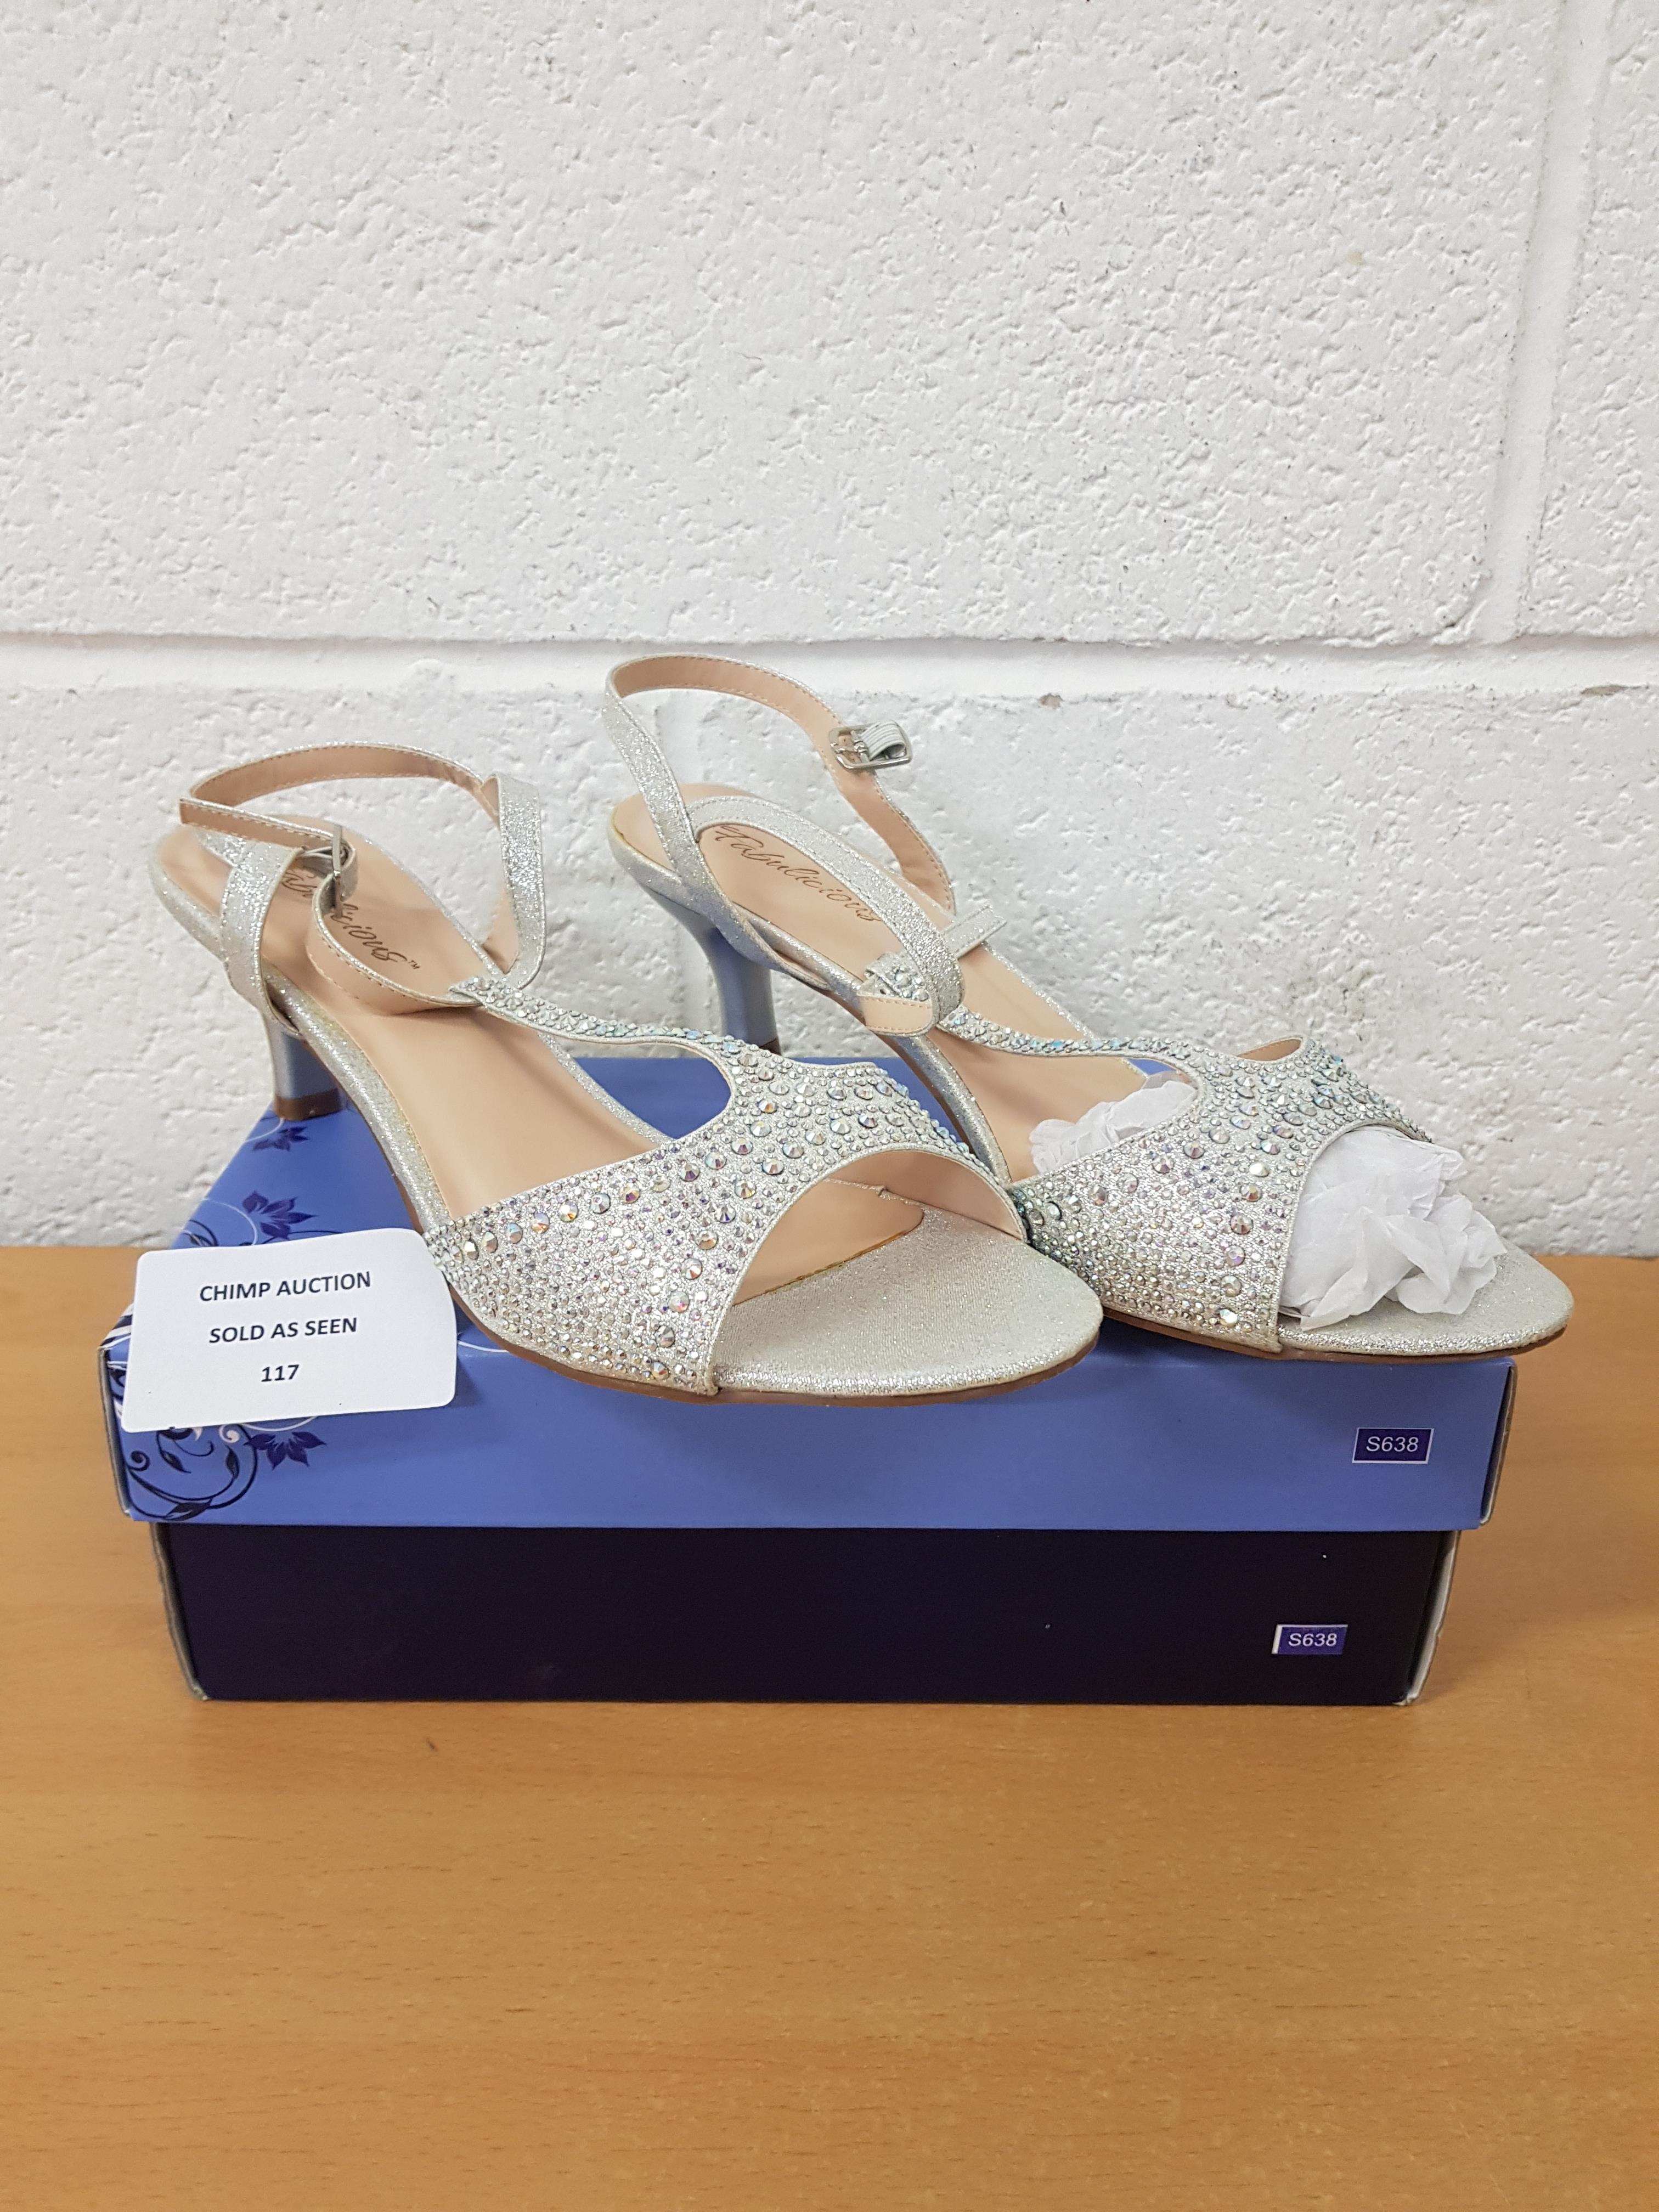 Lot 117 - Fabulicious ladies shoes UK 8